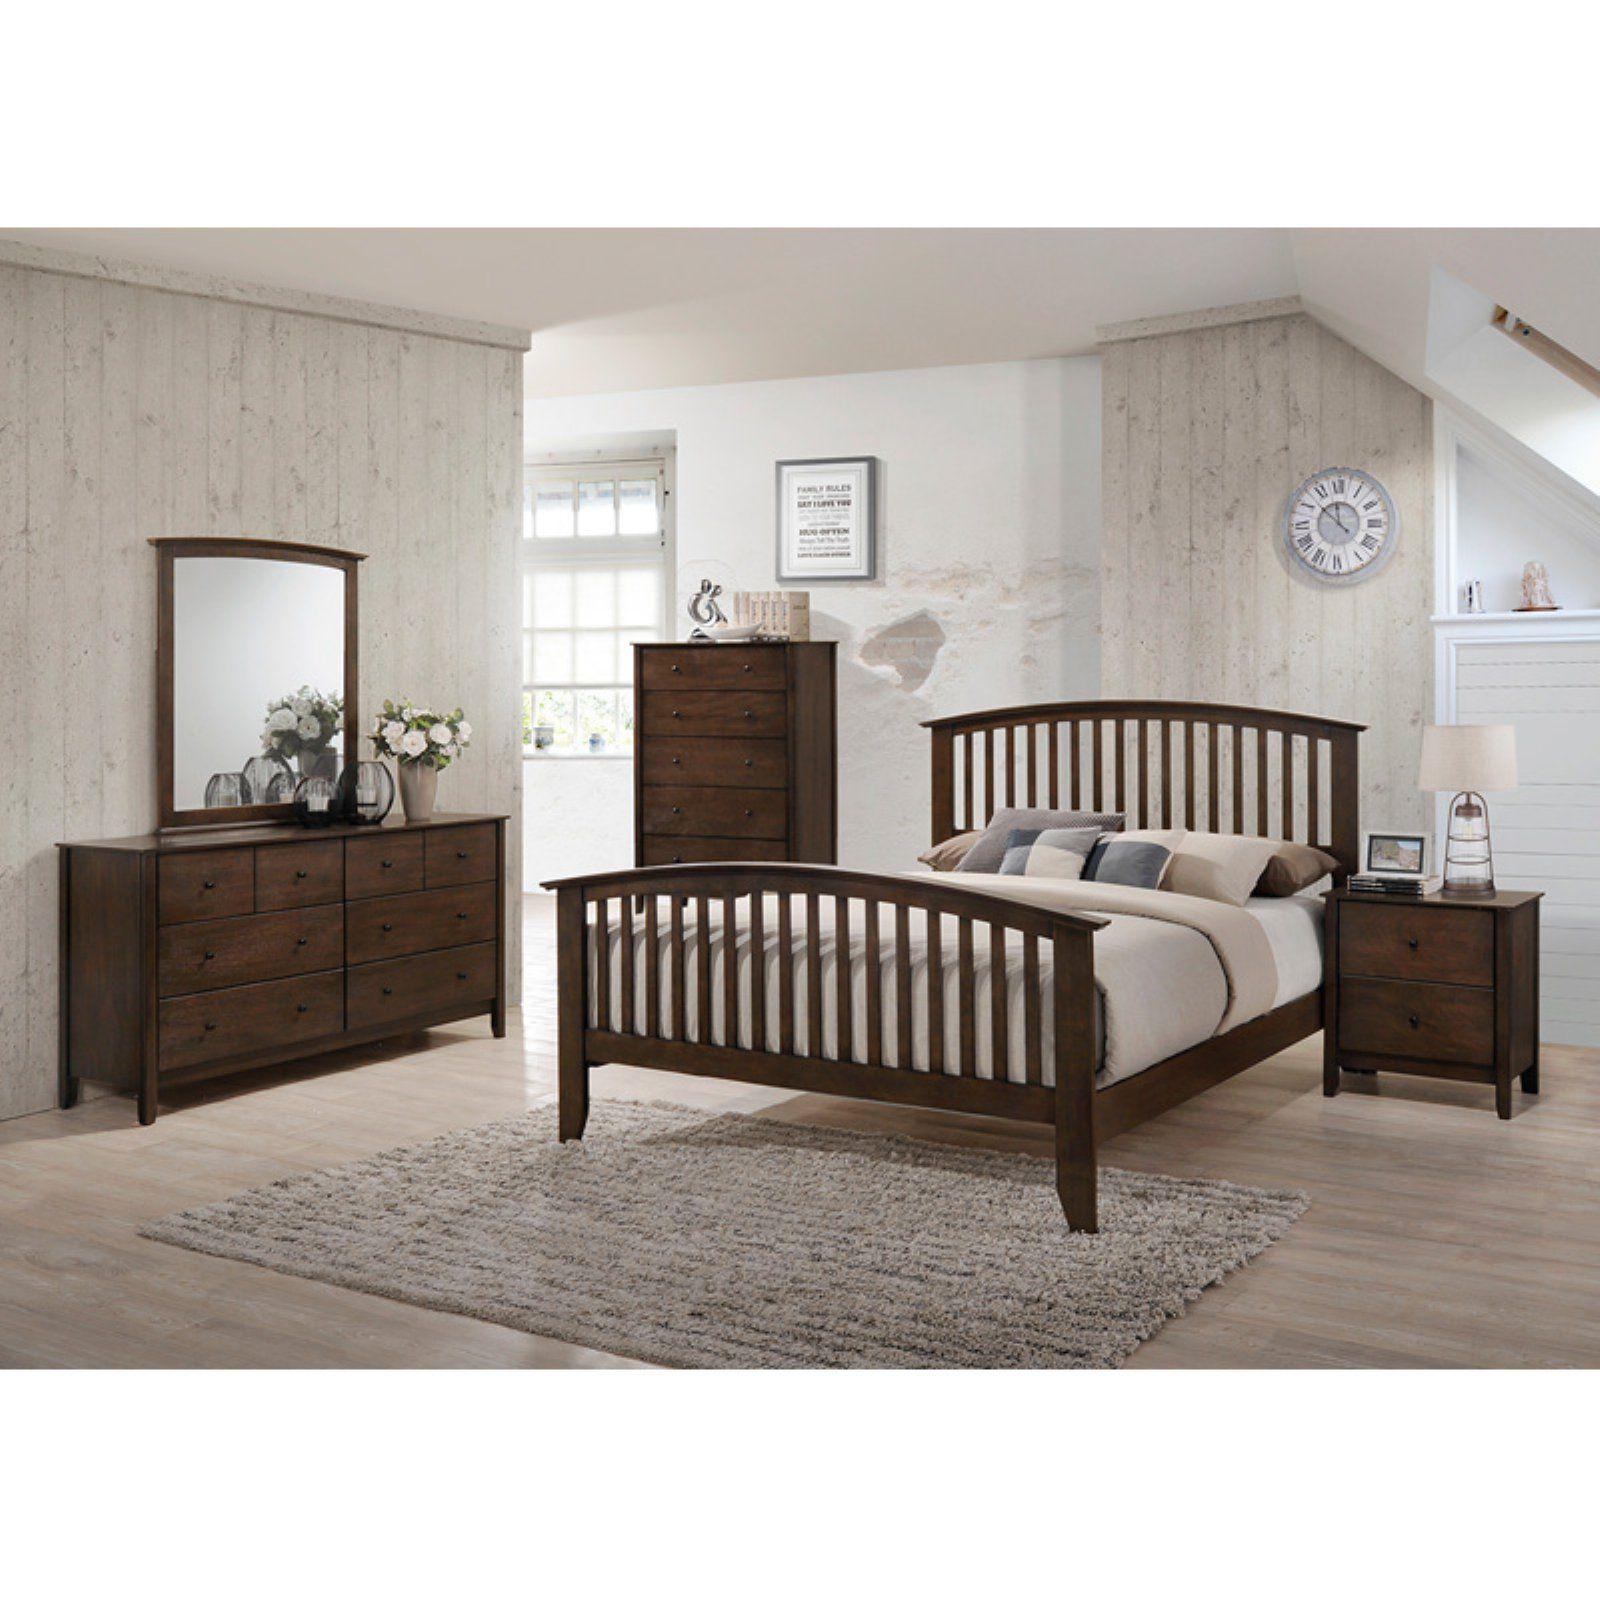 Best K B Furniture Chestnut Brown Wood Queen Size Panel Bed 640 x 480